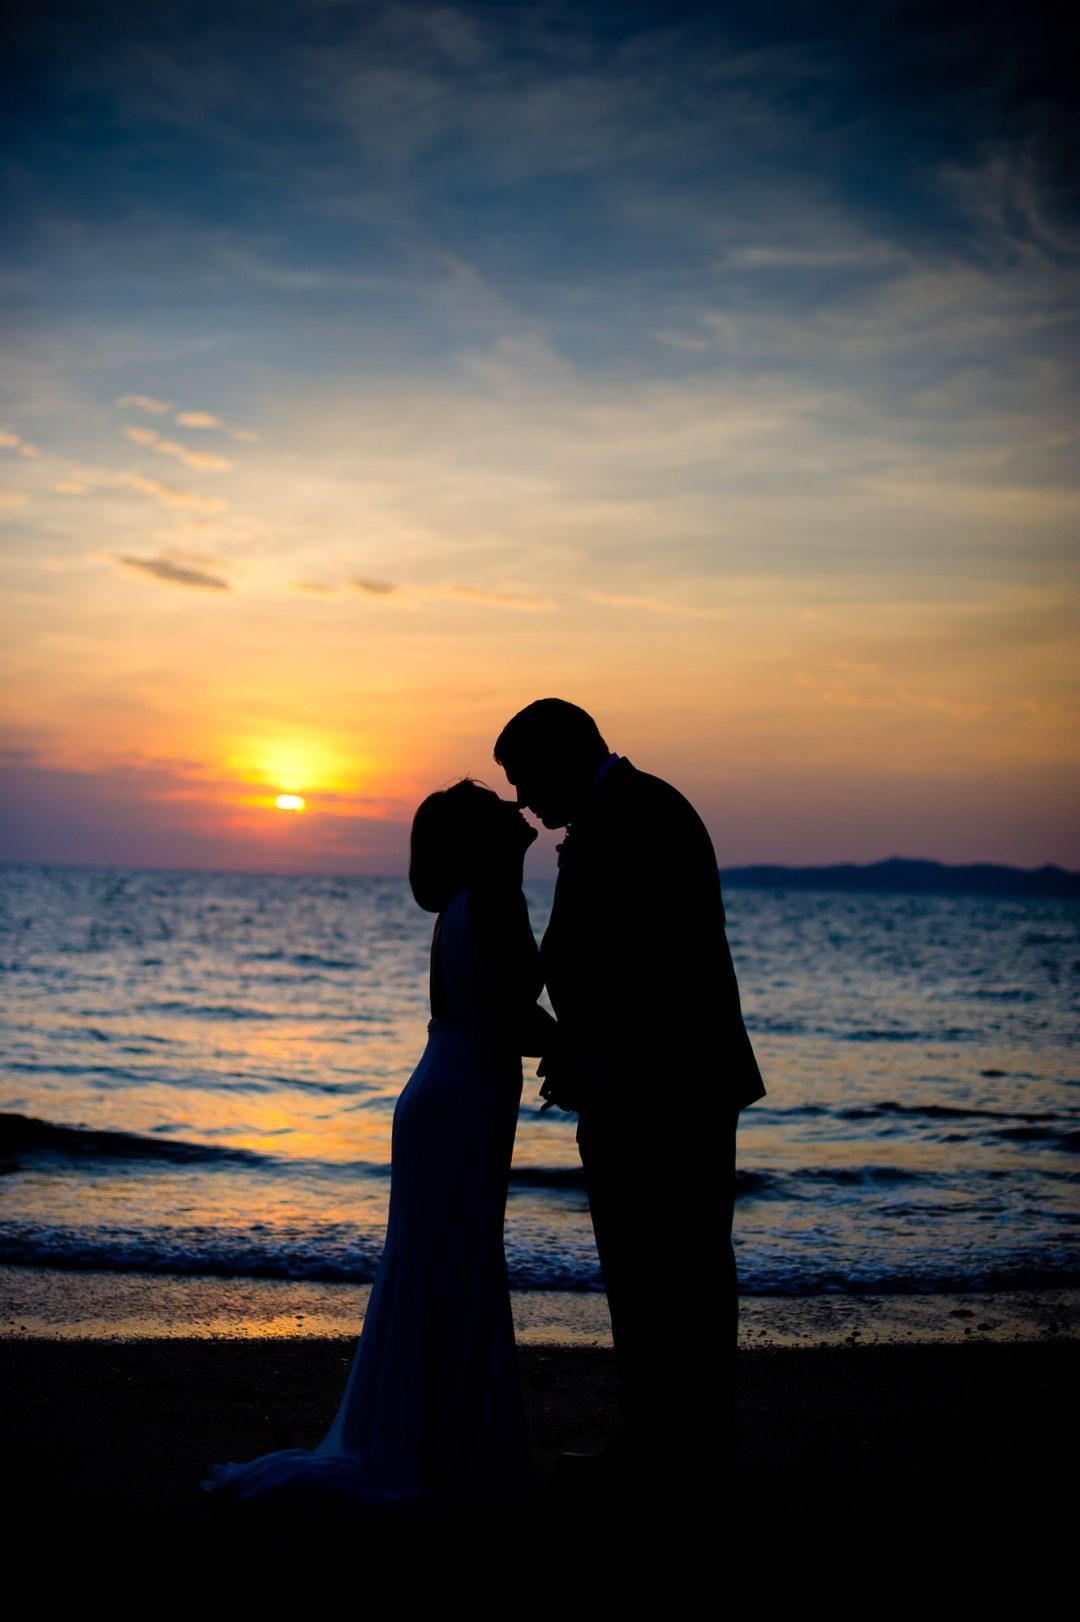 Thailand Wedding Photography | Royal Varuna Yacht Club Pattaya Wedding